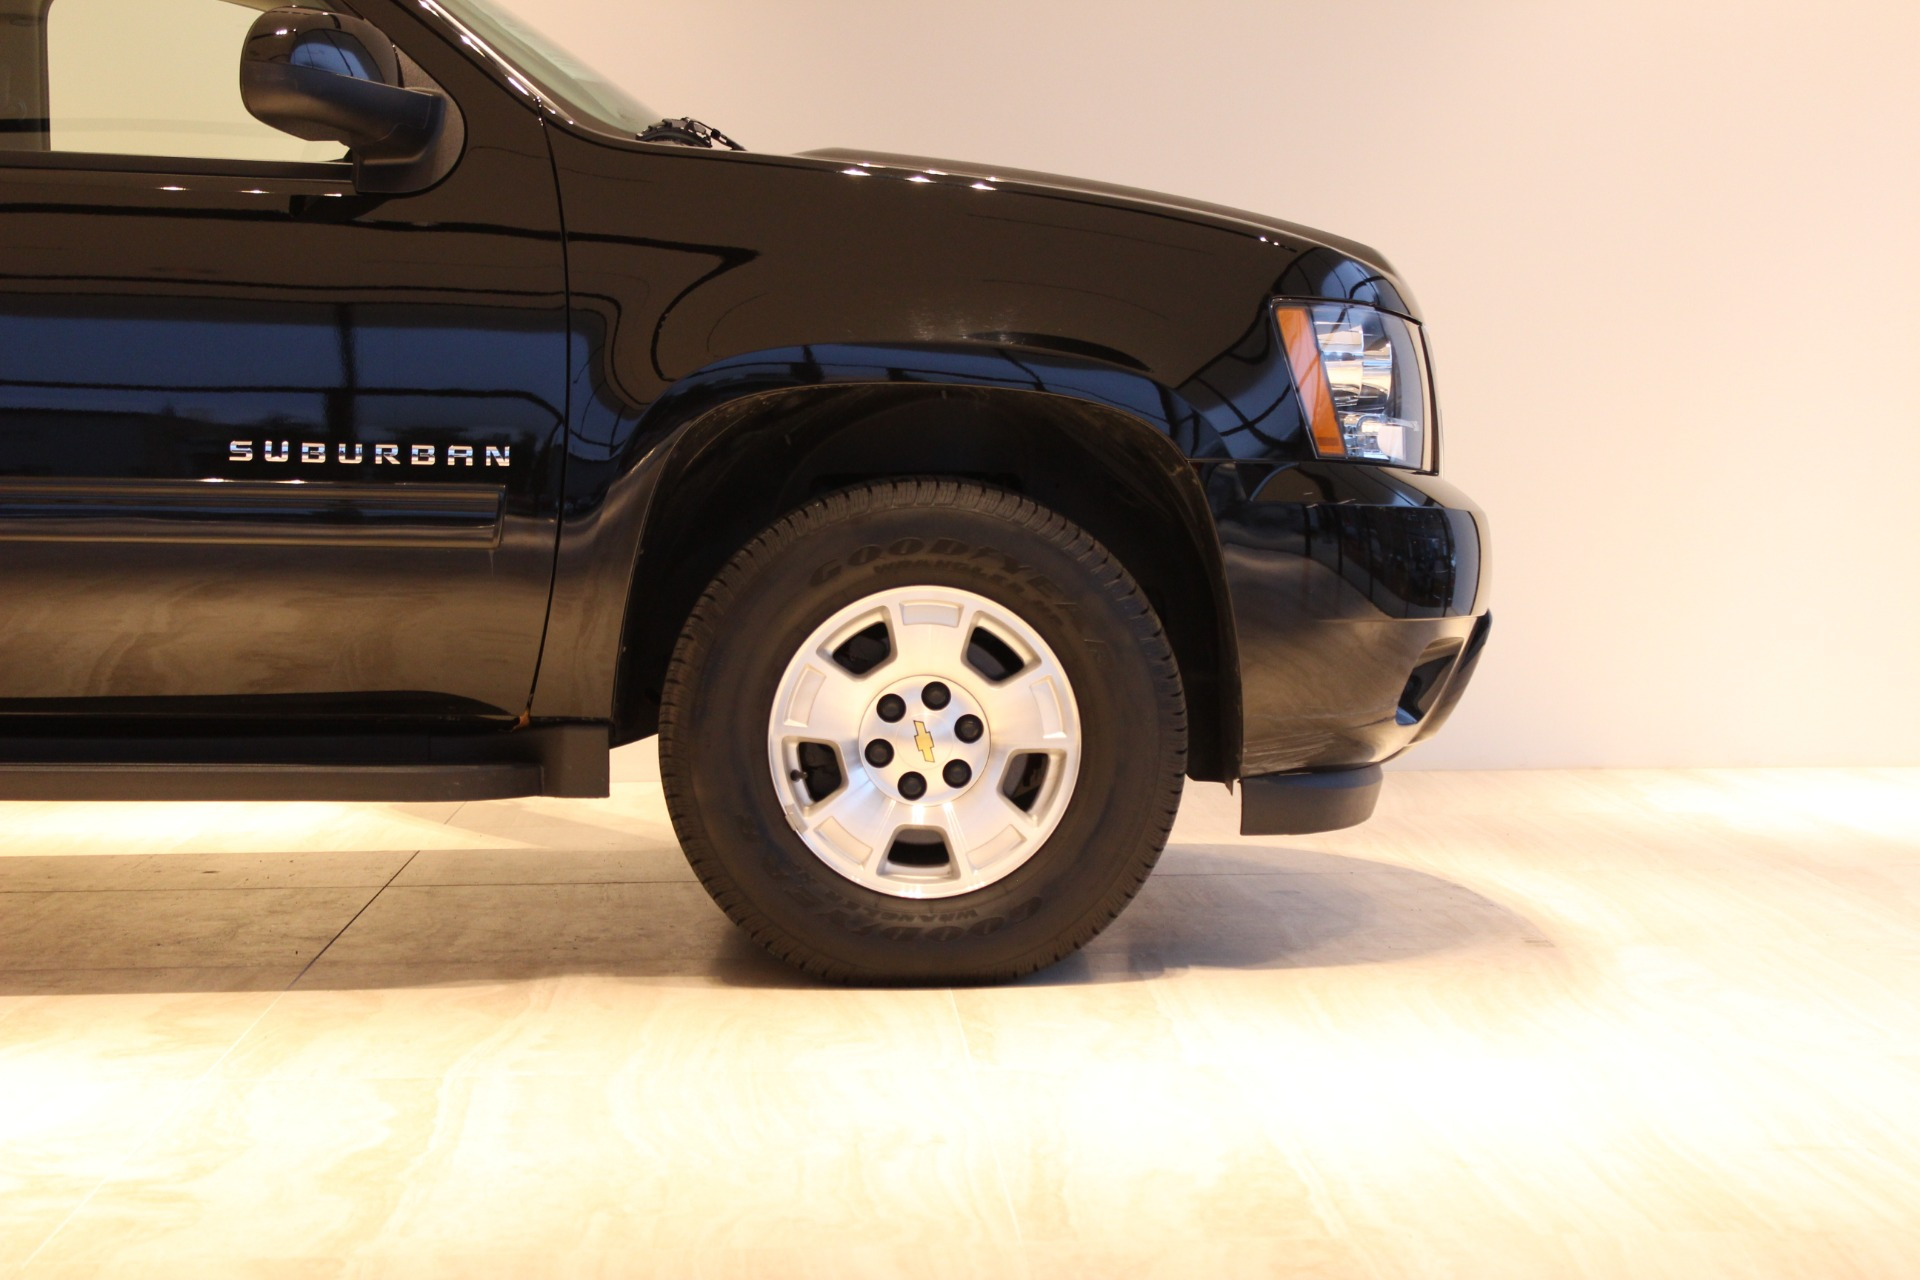 2013 Chevrolet Suburban 1500 For Sale In Washington Dc